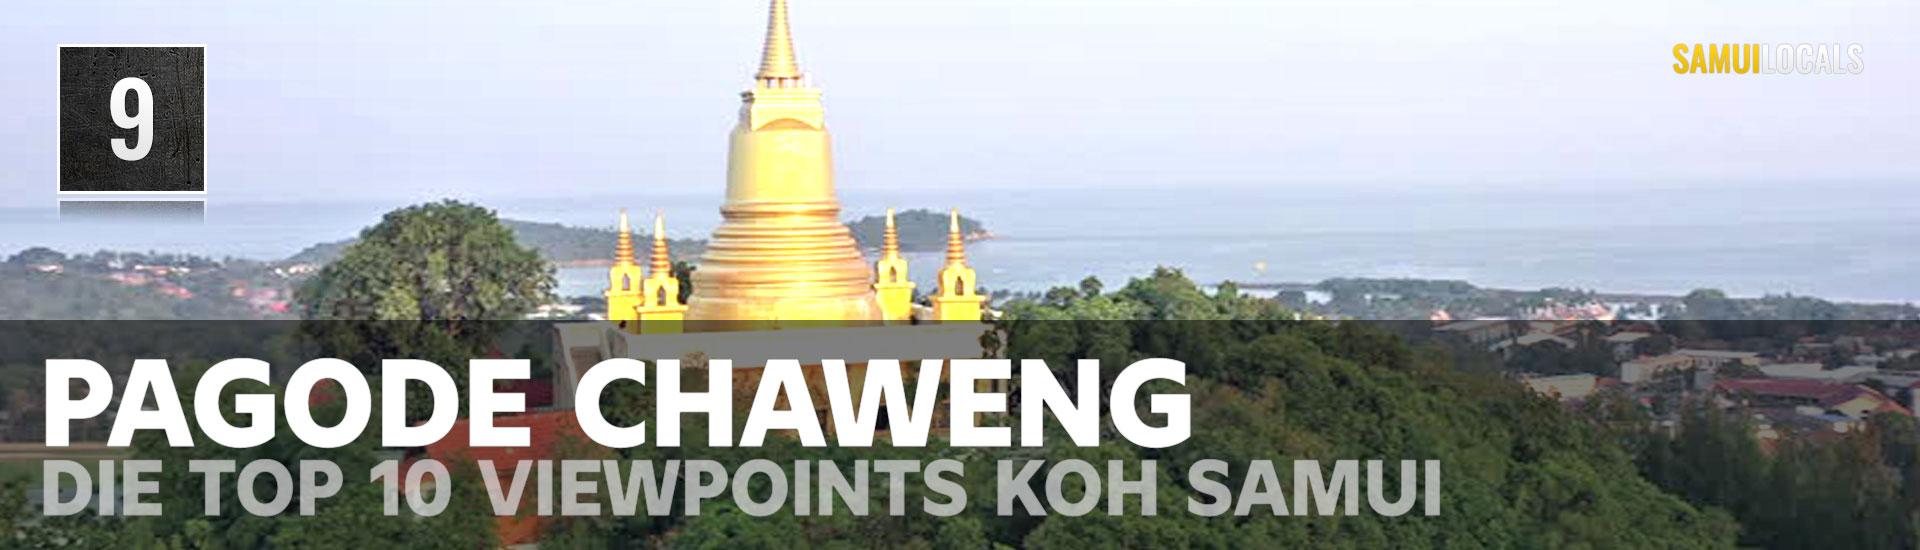 viewpoint_koh_samui_pagode_chaweng